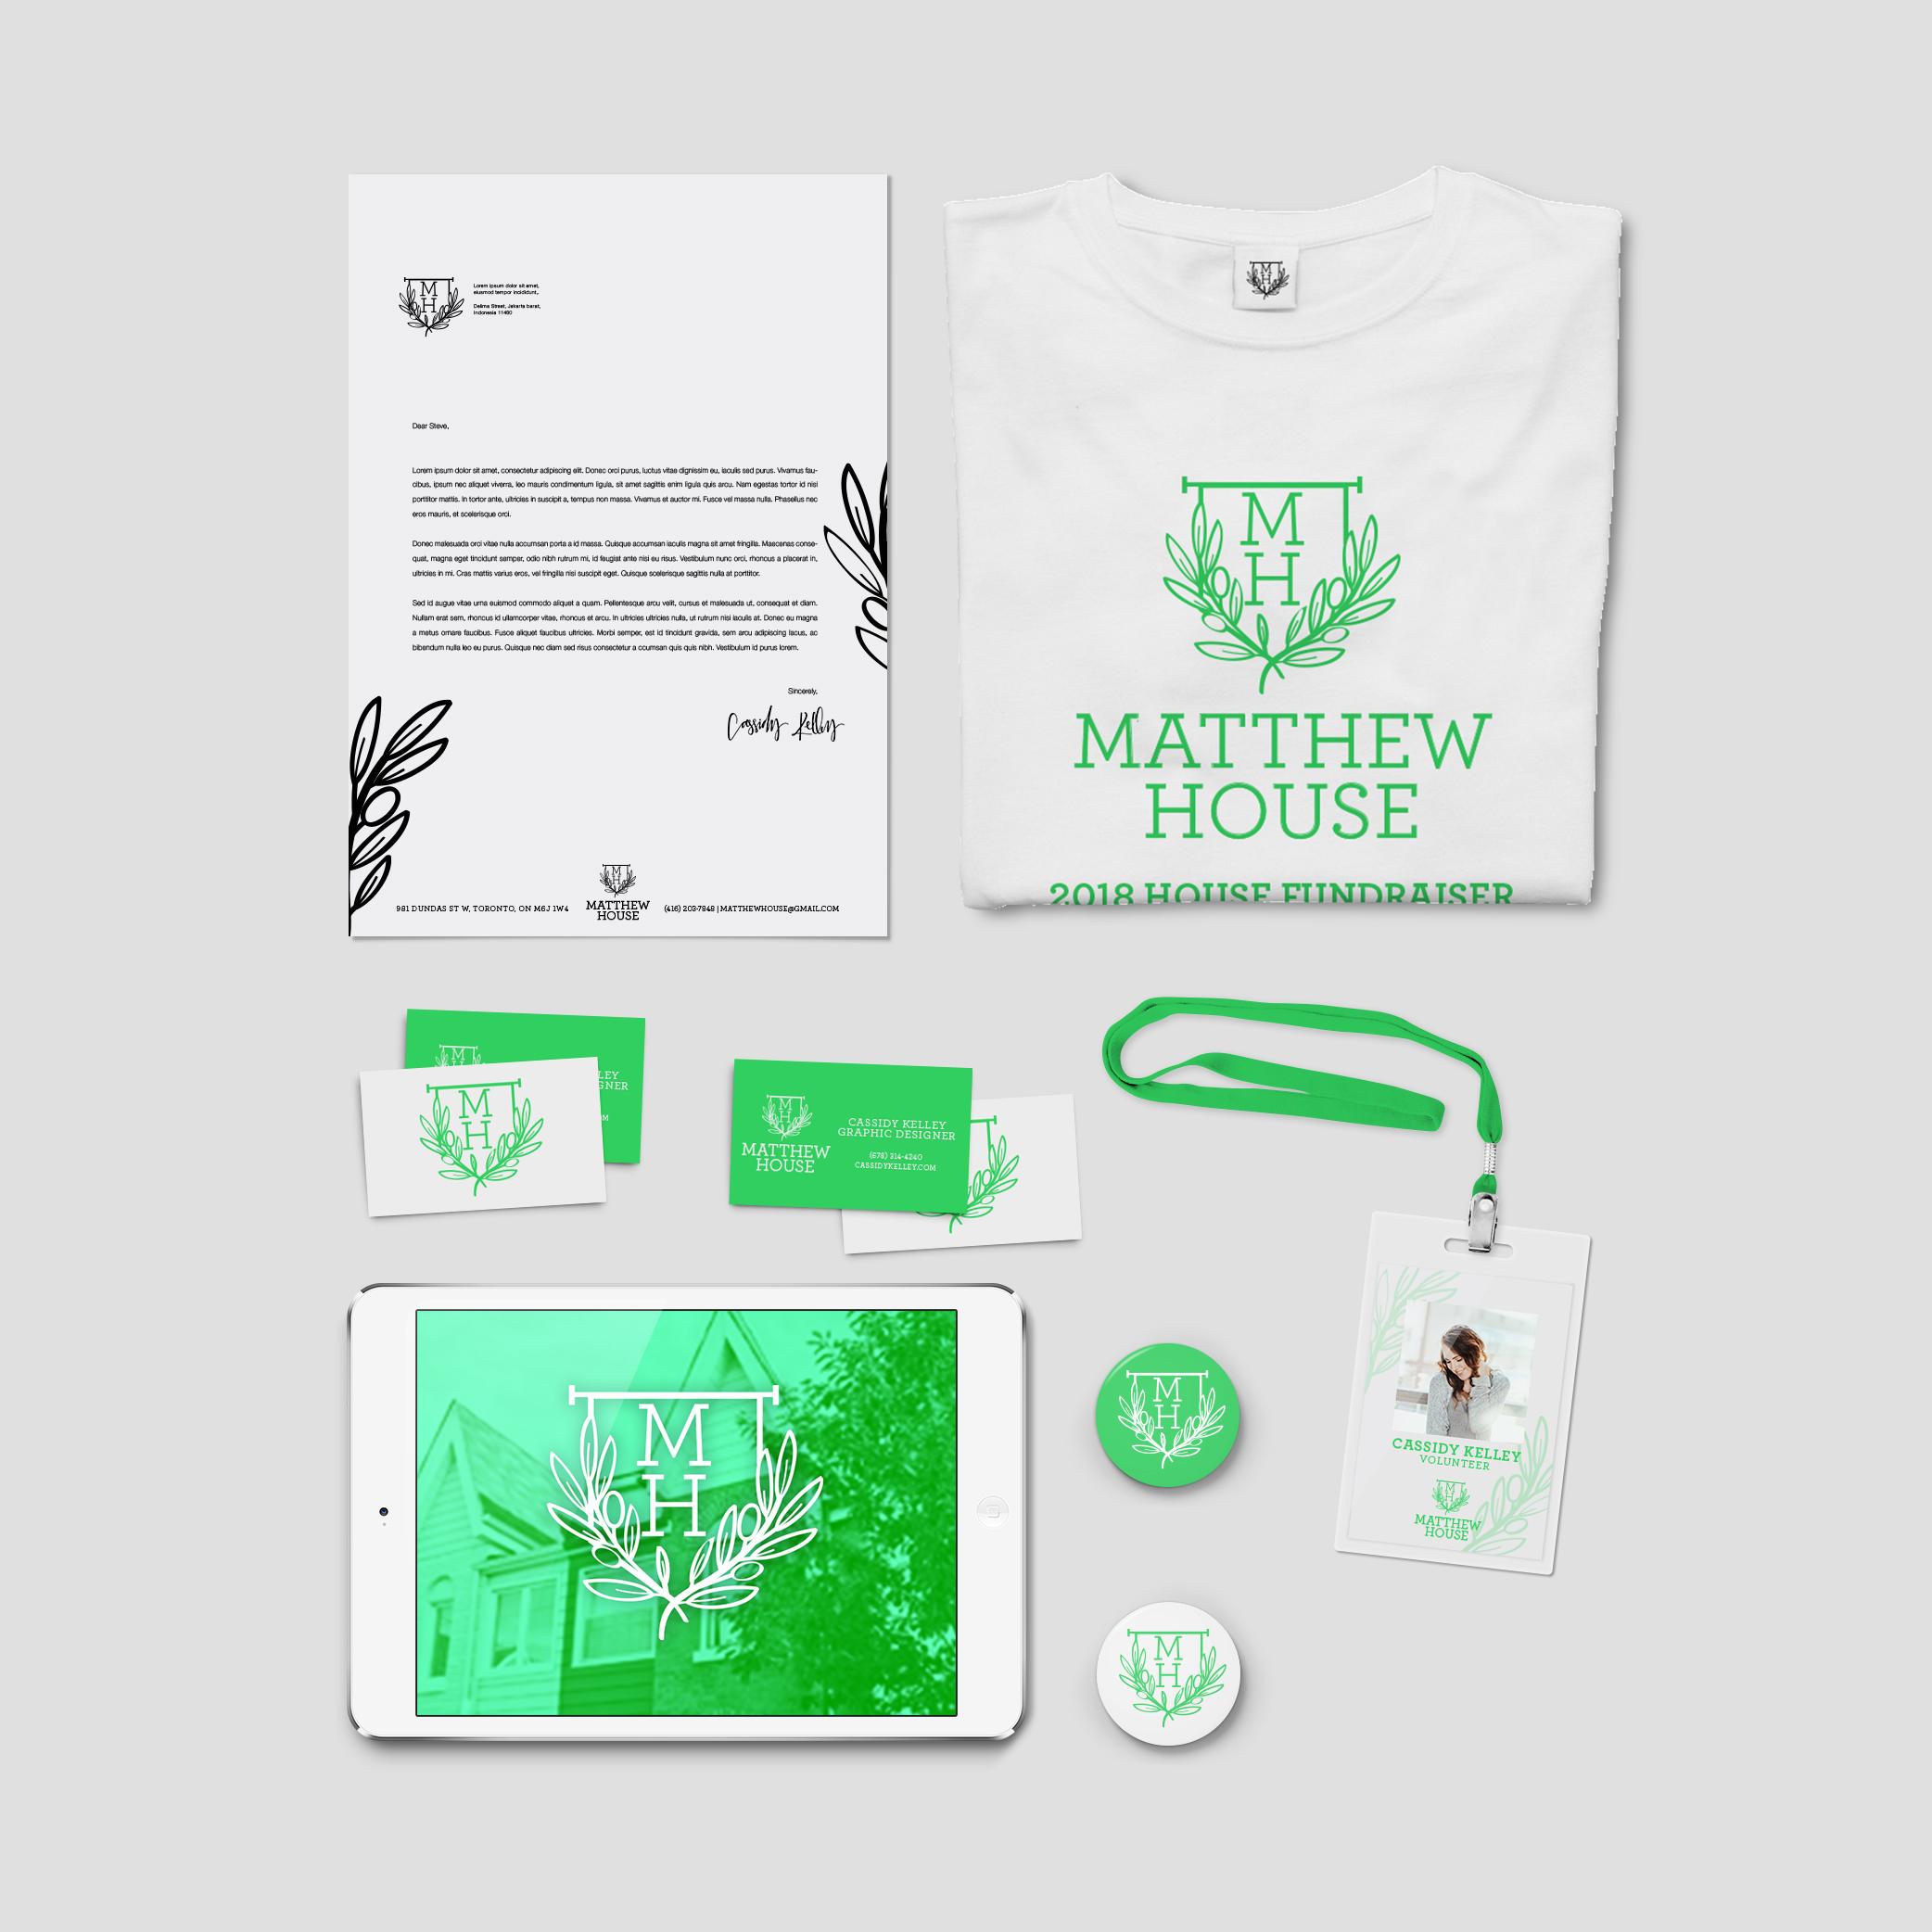 030 matthew house mockup